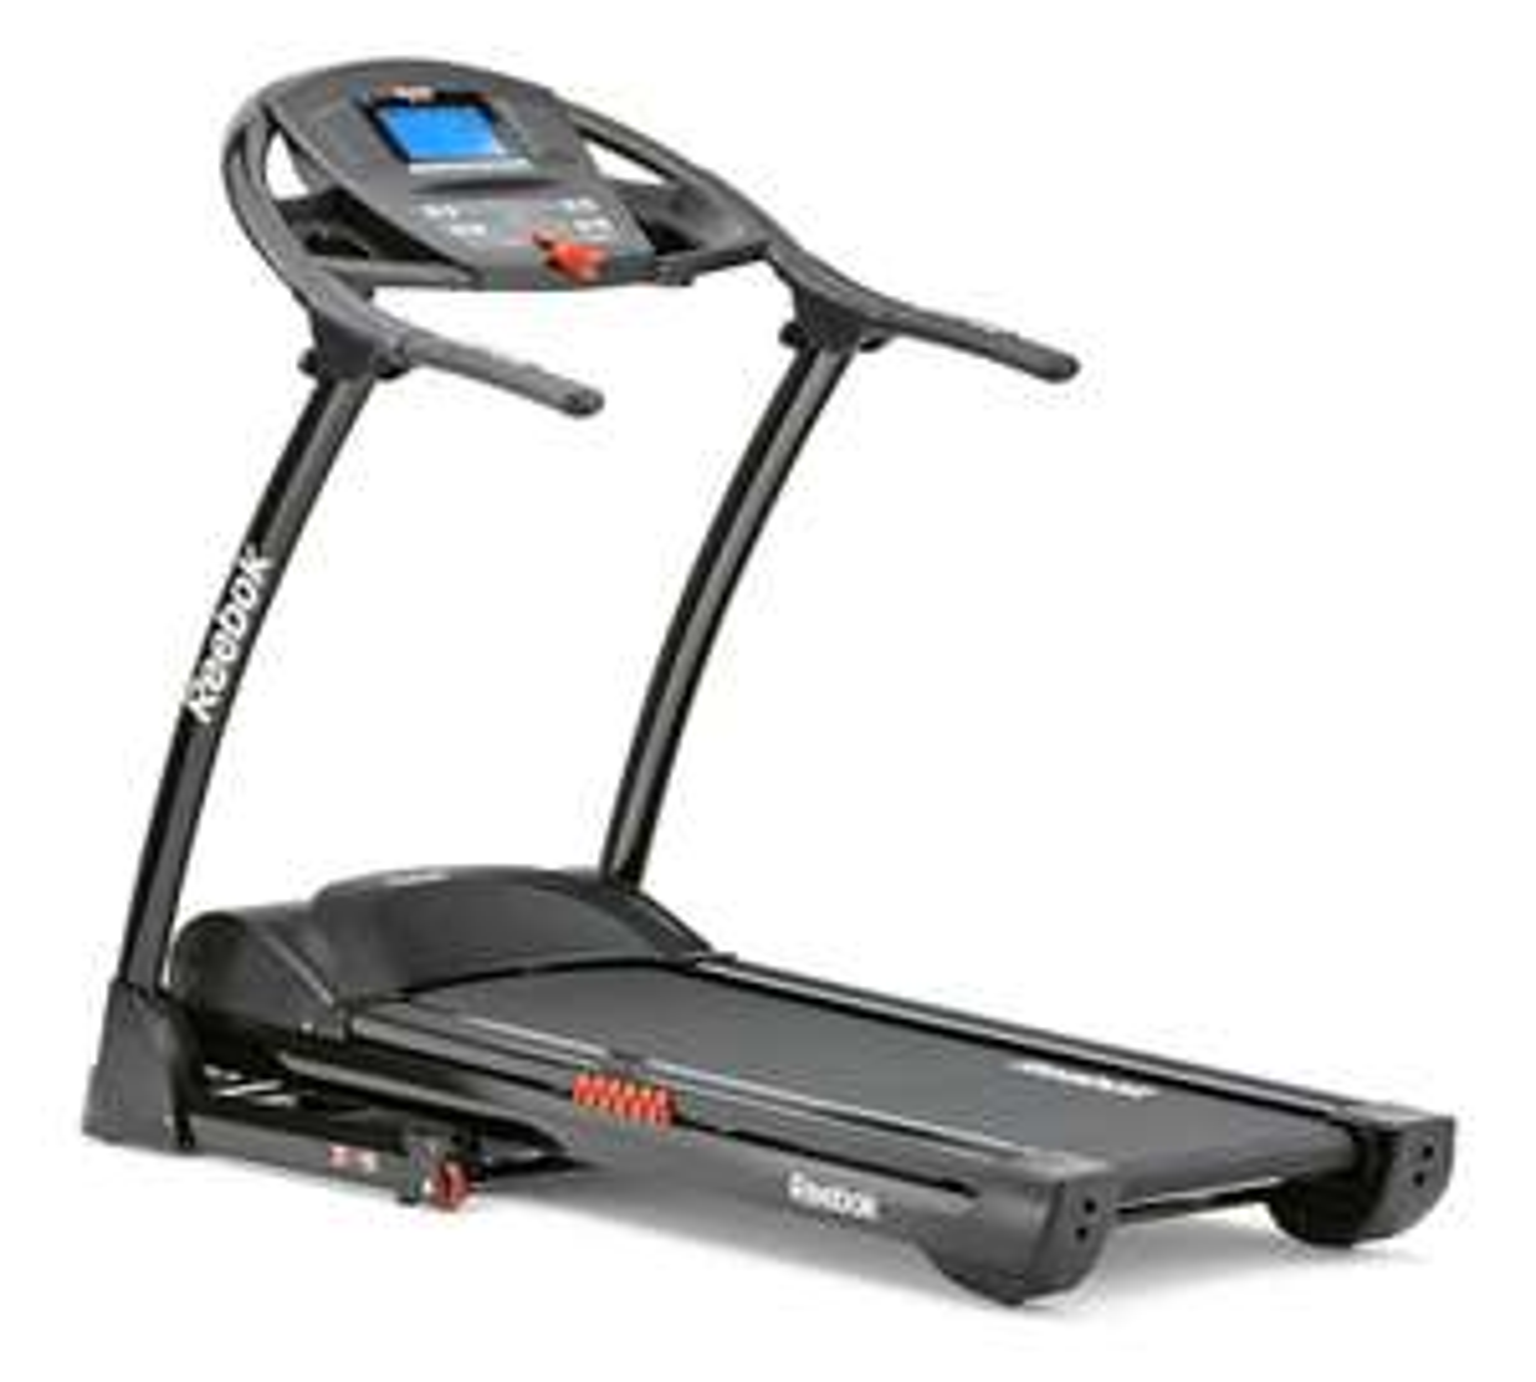 Reebok ZR9 Treadmill @ Argos £342.94 inc. Delivery